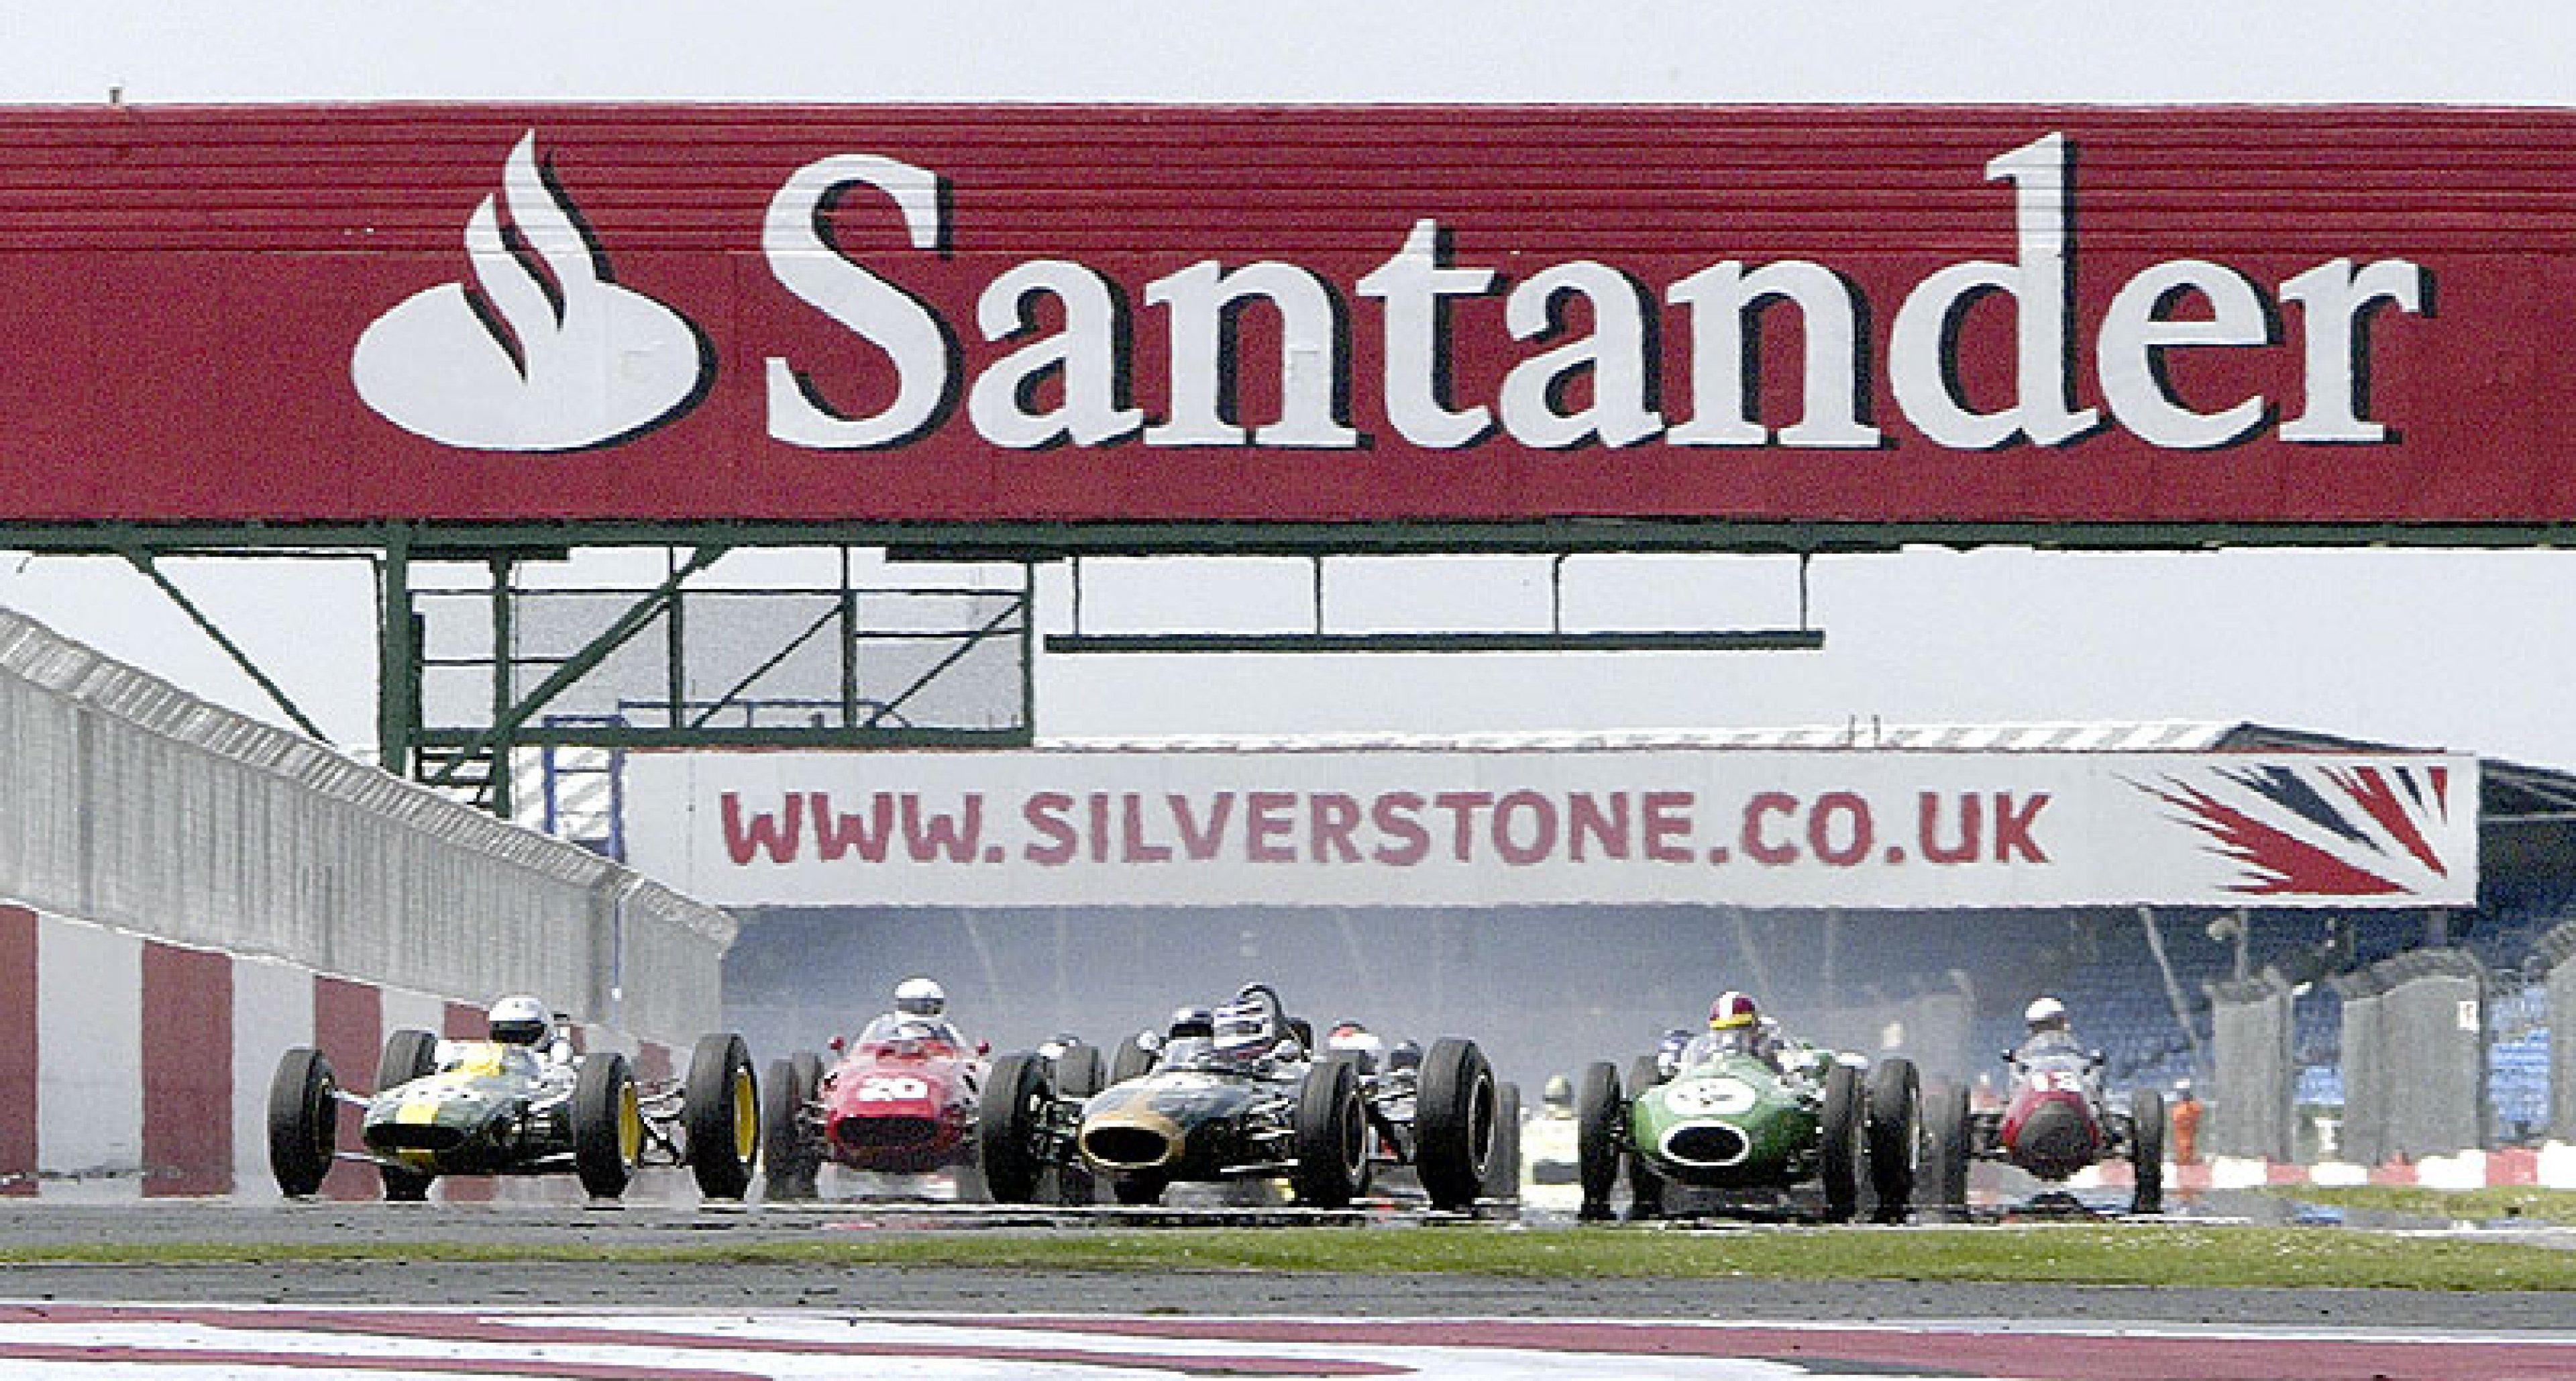 Silverstone Classic 2008